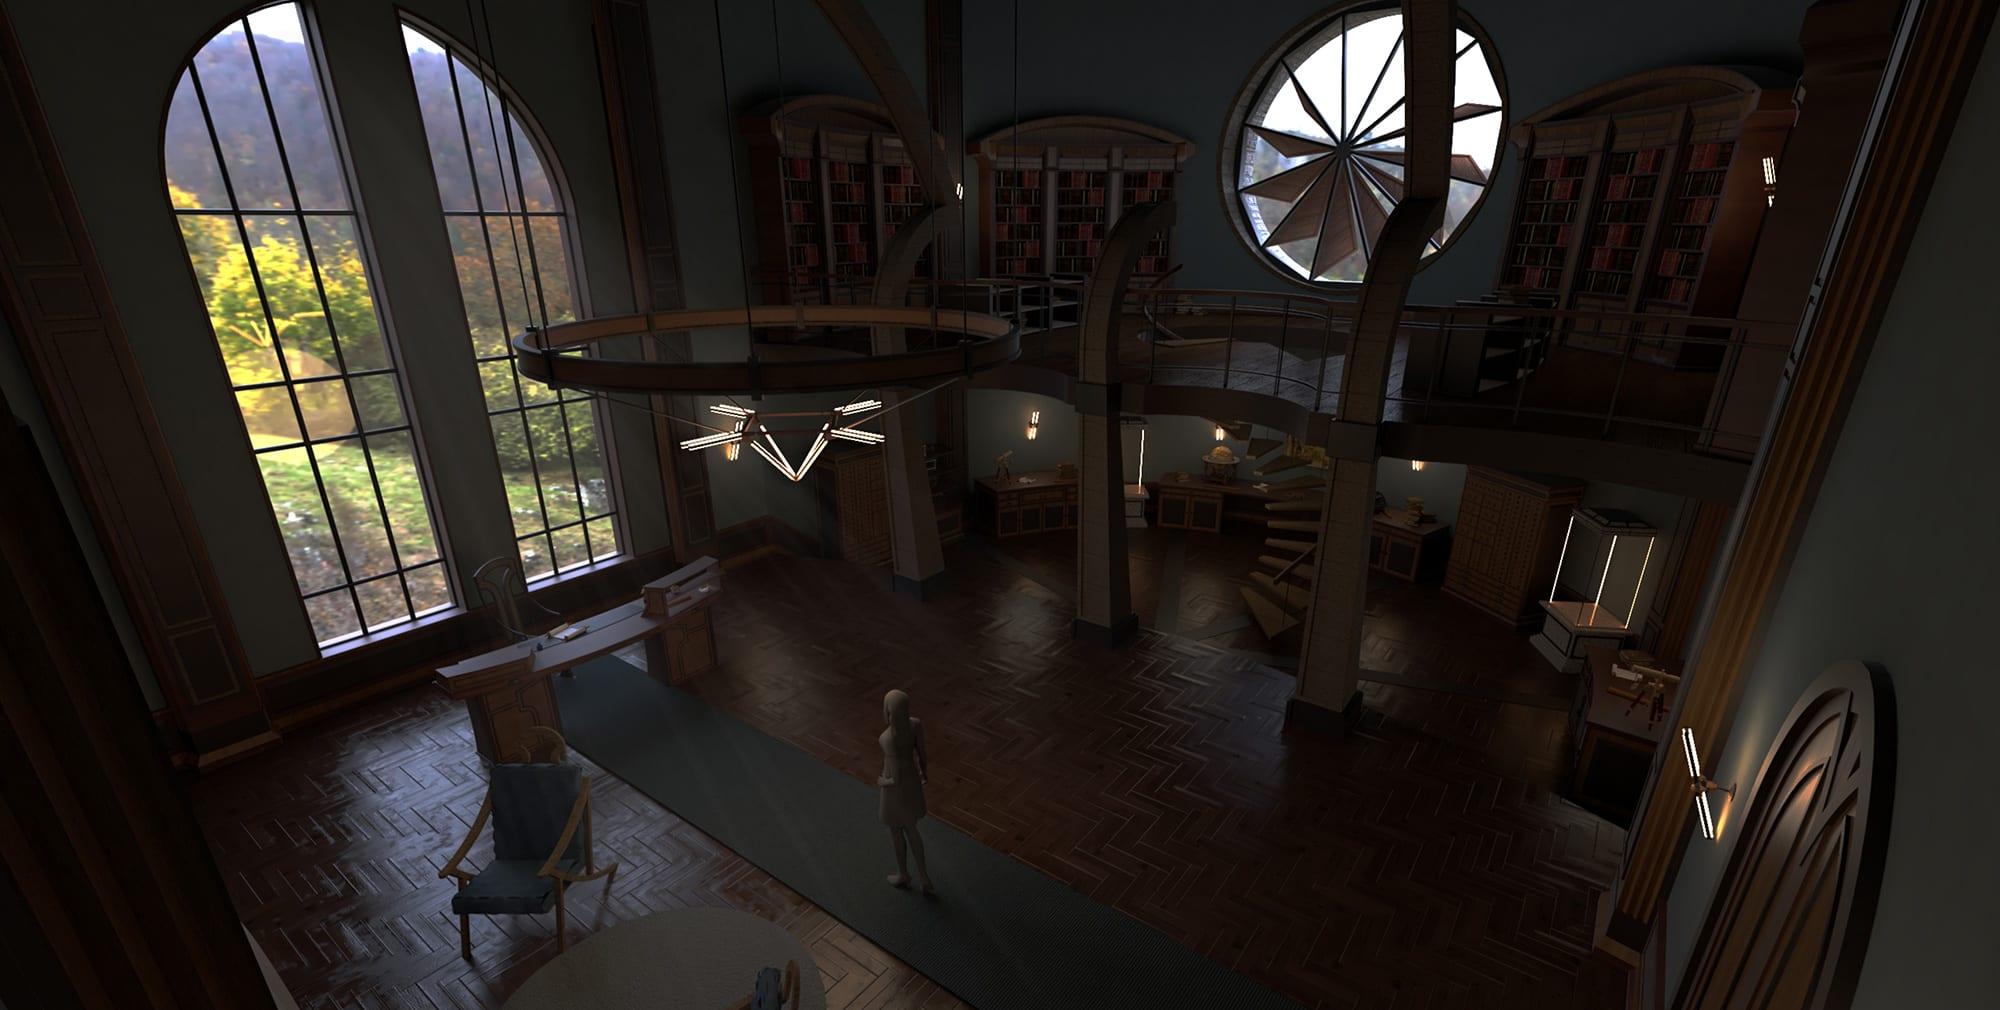 ba-production-arts-for-screen-Charlie-Bartlett-interior.jpg